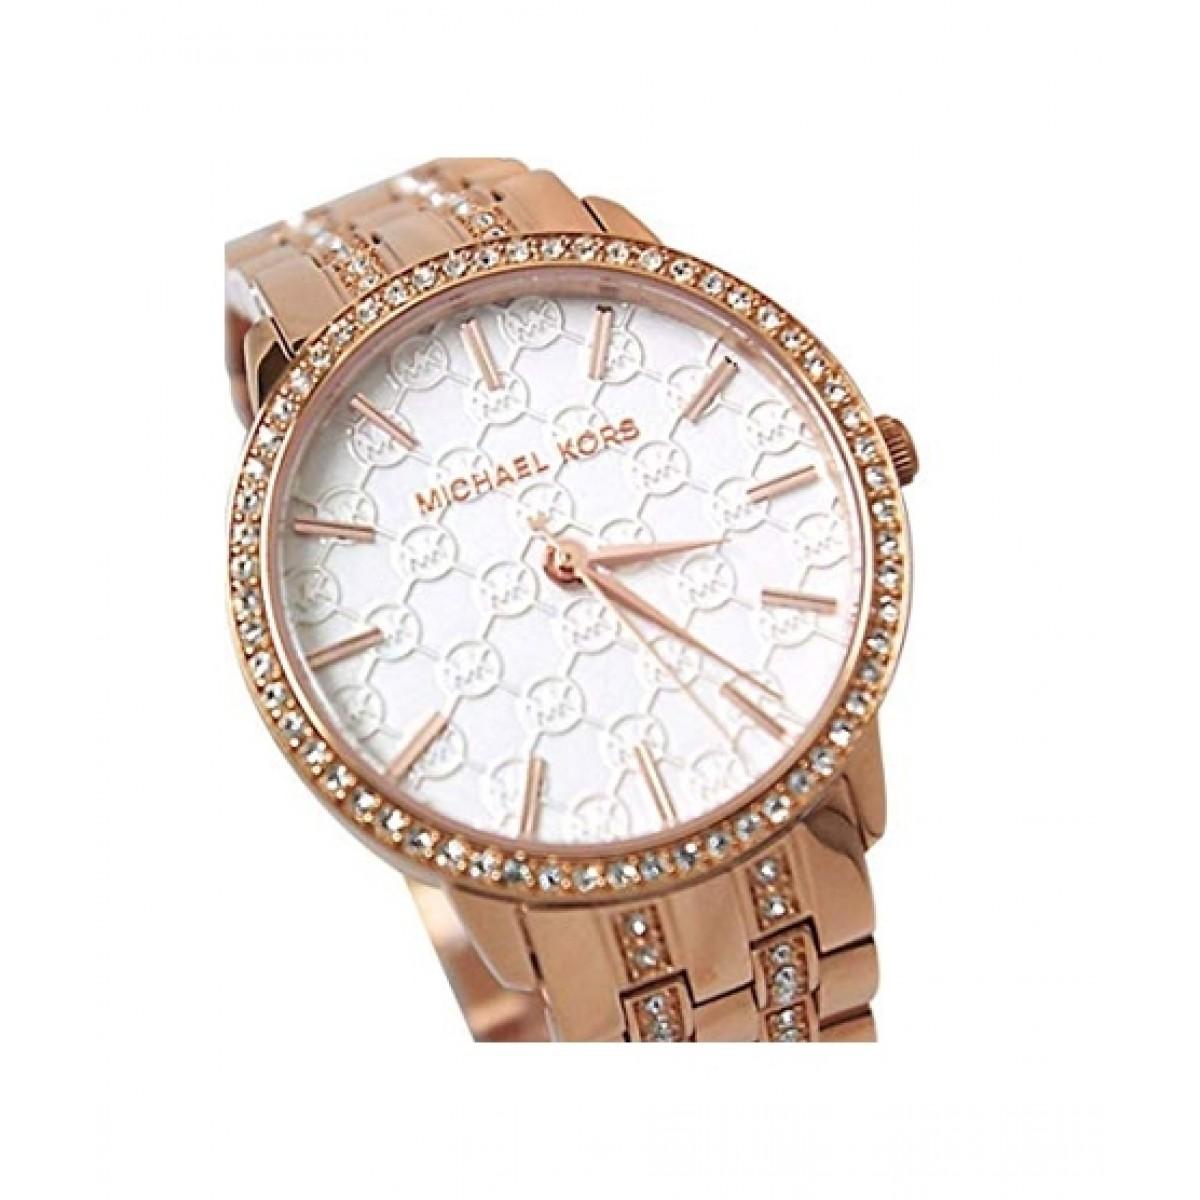 39980ce4e37f Michael Kors Women's Watch (MK3183) Price in Pakistan | Buy Michael Kors  Lady Nini Women's Watch Rose Gold (MK3183) | iShopping.pk